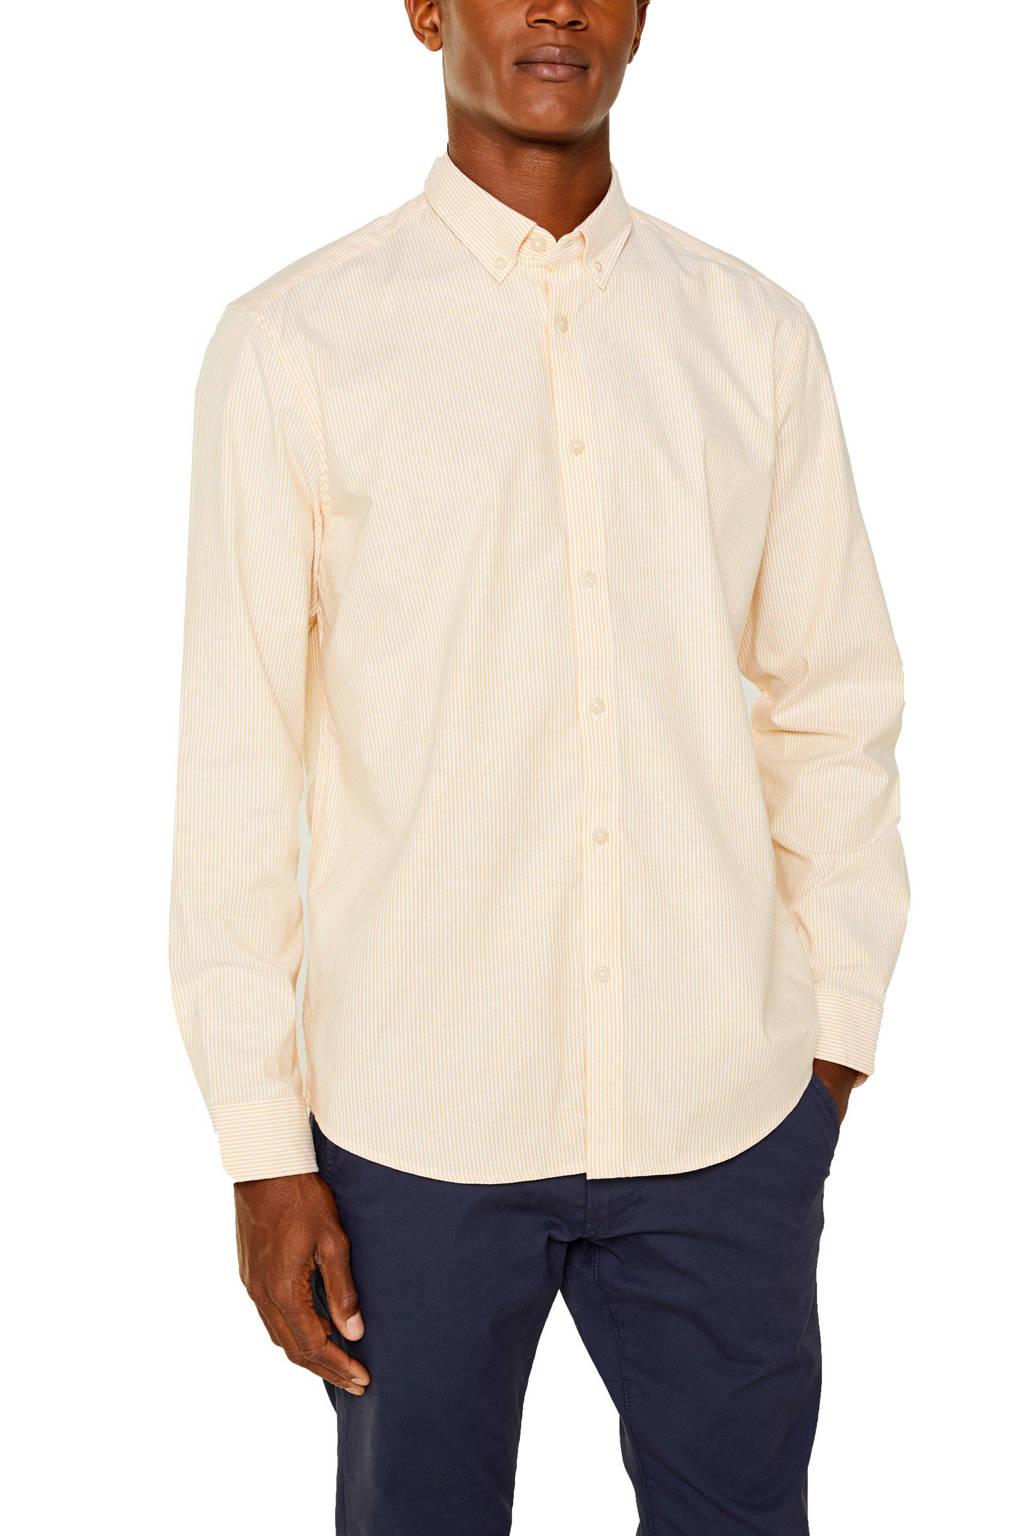 ESPRIT Men Casual slim fit overhemd 03 honey yellow, 03 Honey Yellow